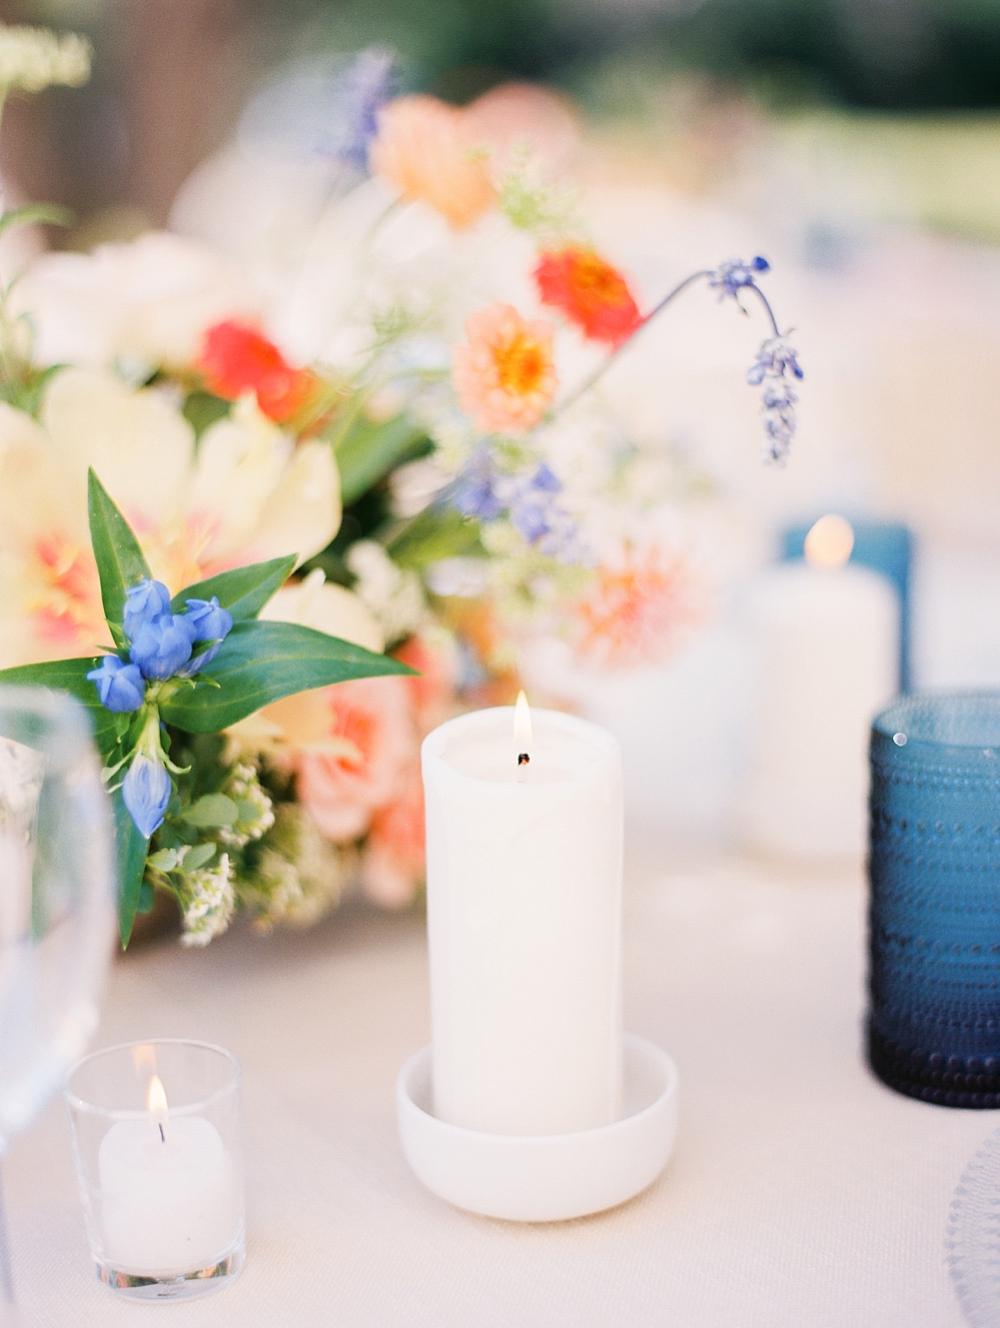 Kristin-La-Voie-Photography-Austin-Wedding-Photographer-the-grand-lady-6